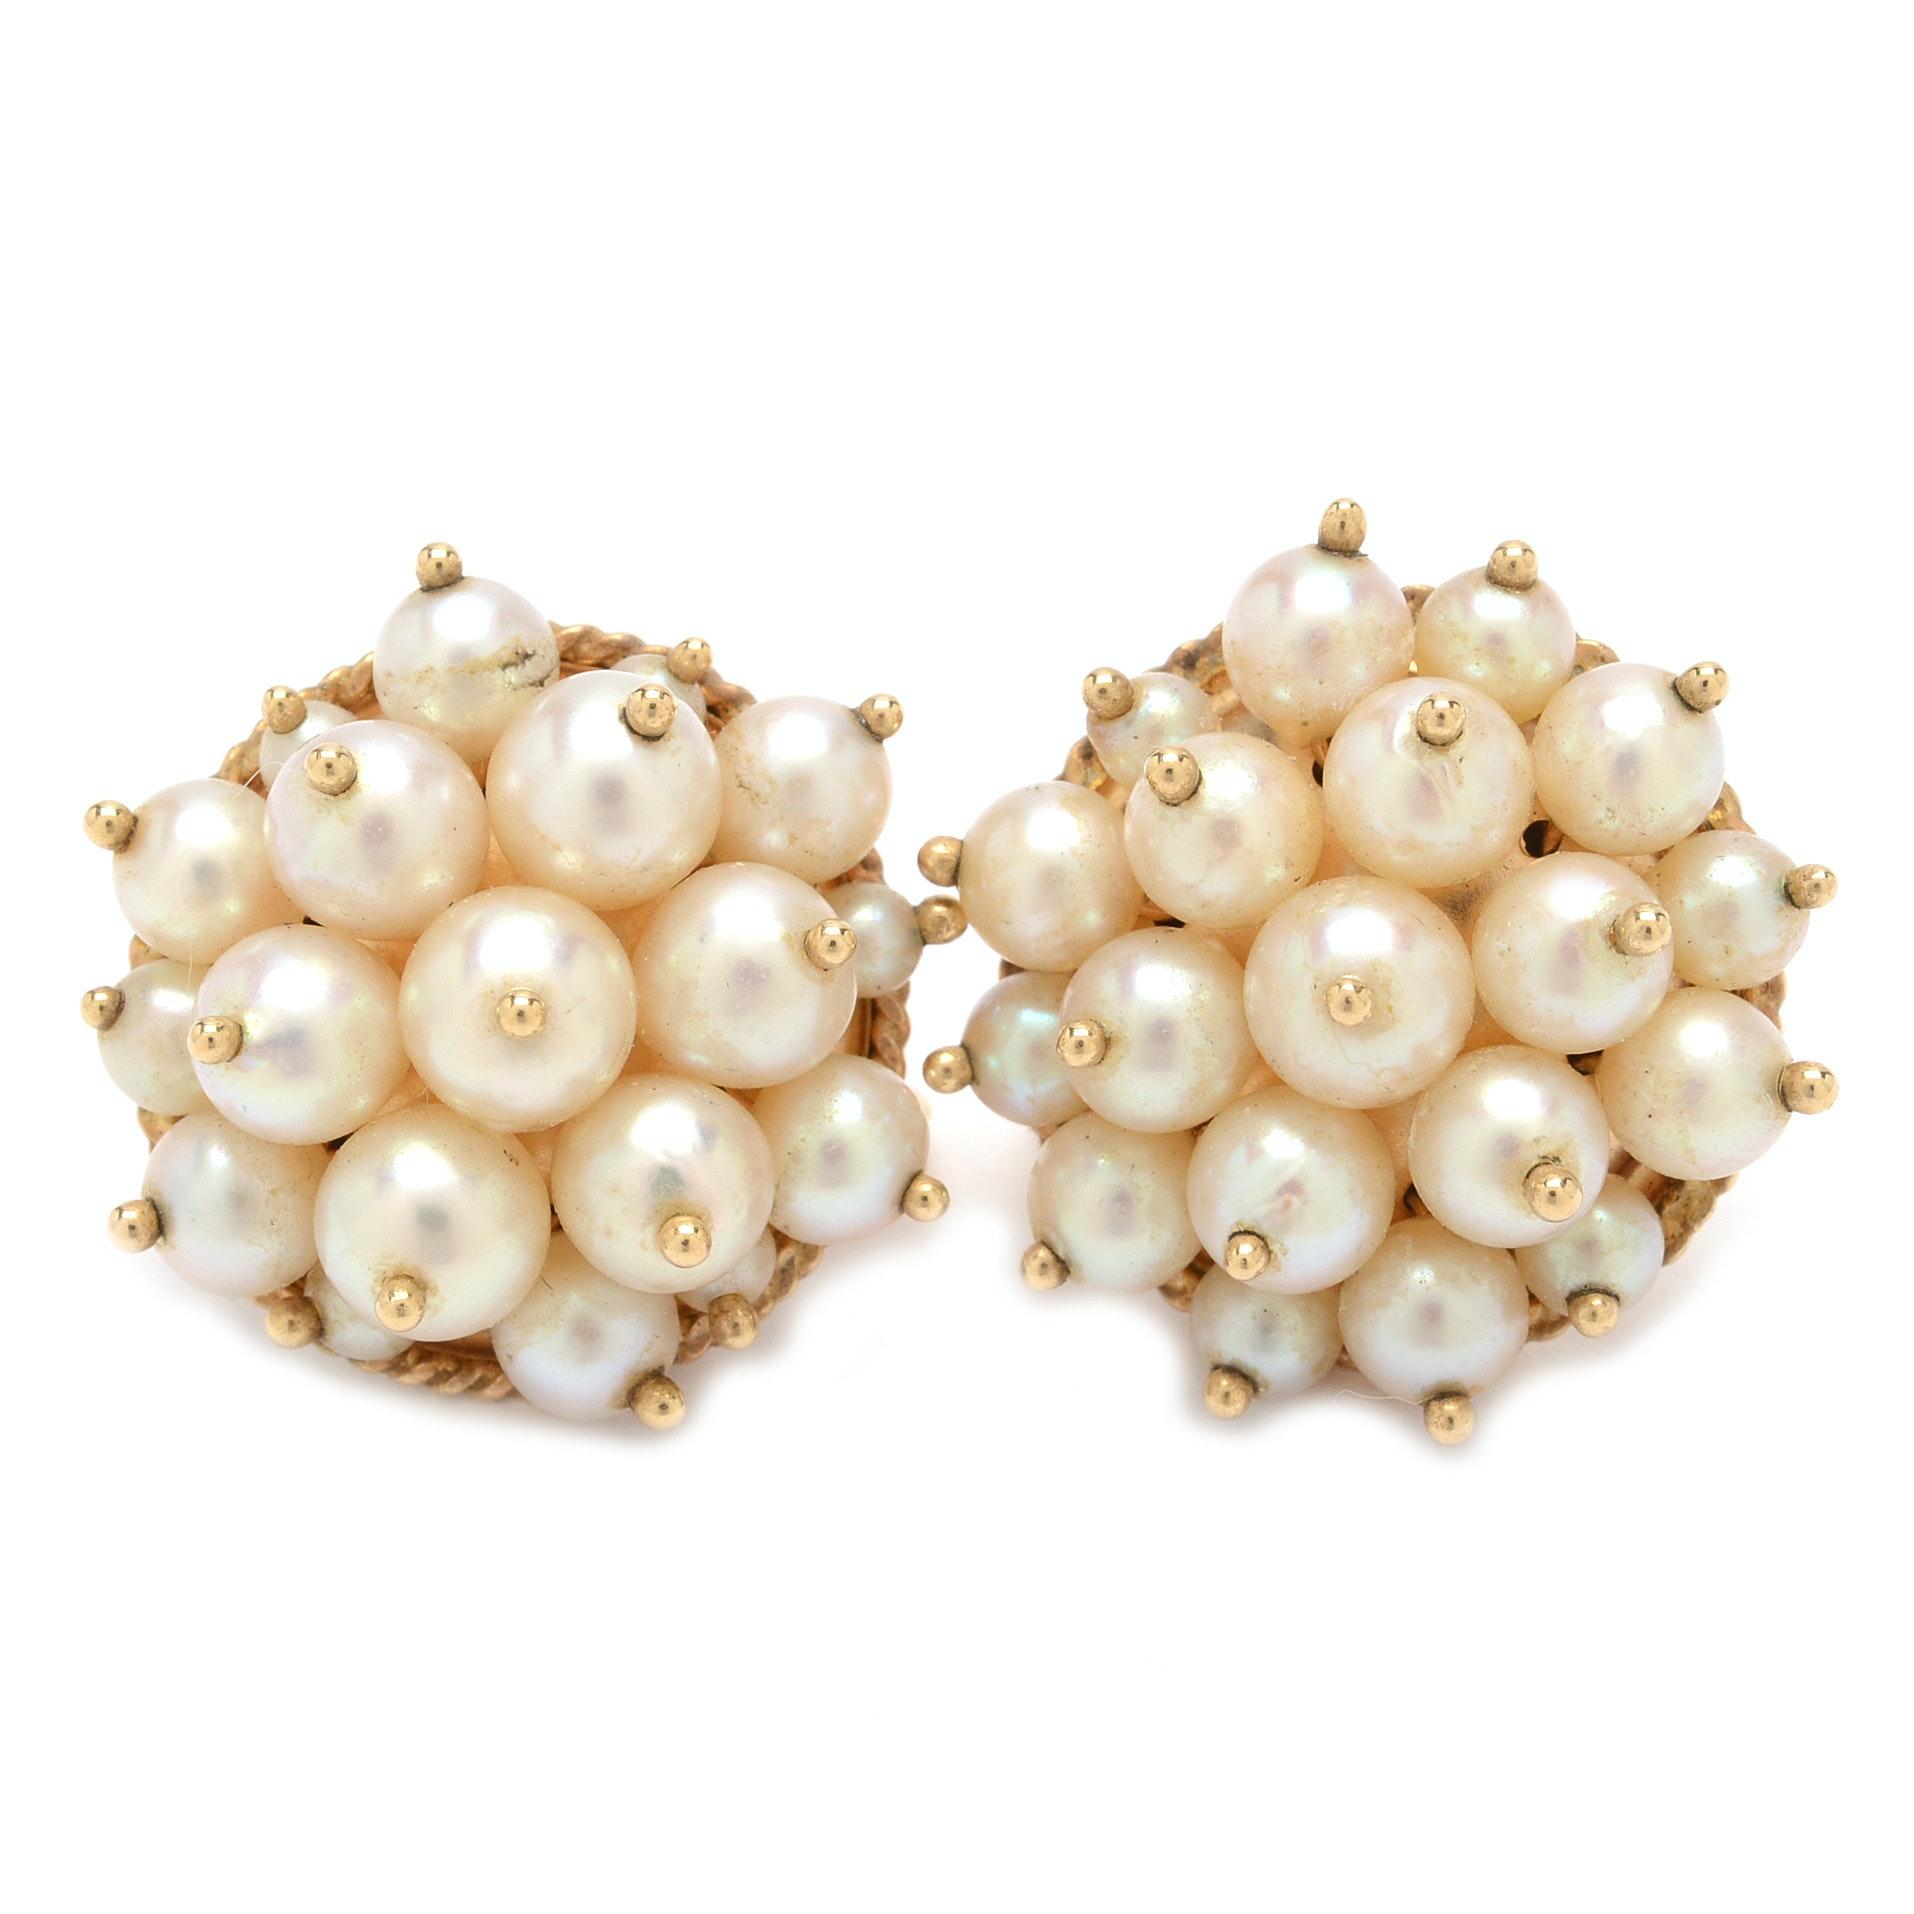 14K Yellow Gold Pearl Cluster Earrings